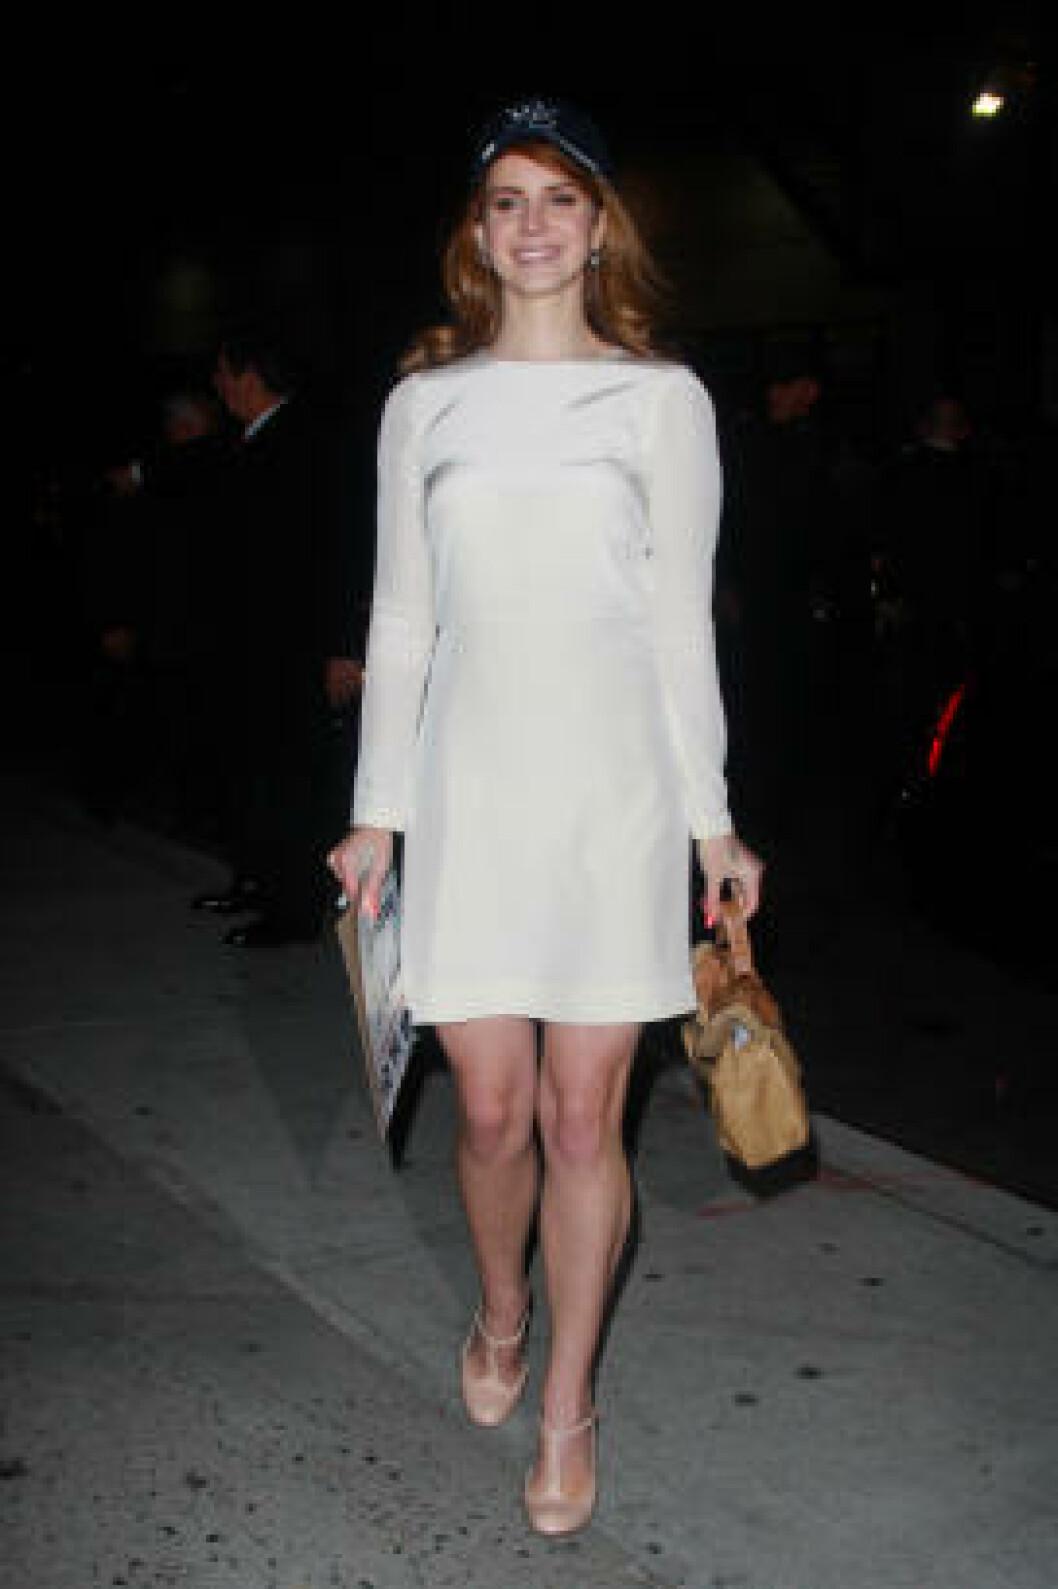 <strong>YNDLING:</strong> Lana Del Rey ble på kort tid en av både pop- og moteverdnenes yndlinger. Her er hun på «The Late Show» med David Letterman tidligere i år. Foto: Stella Pictures